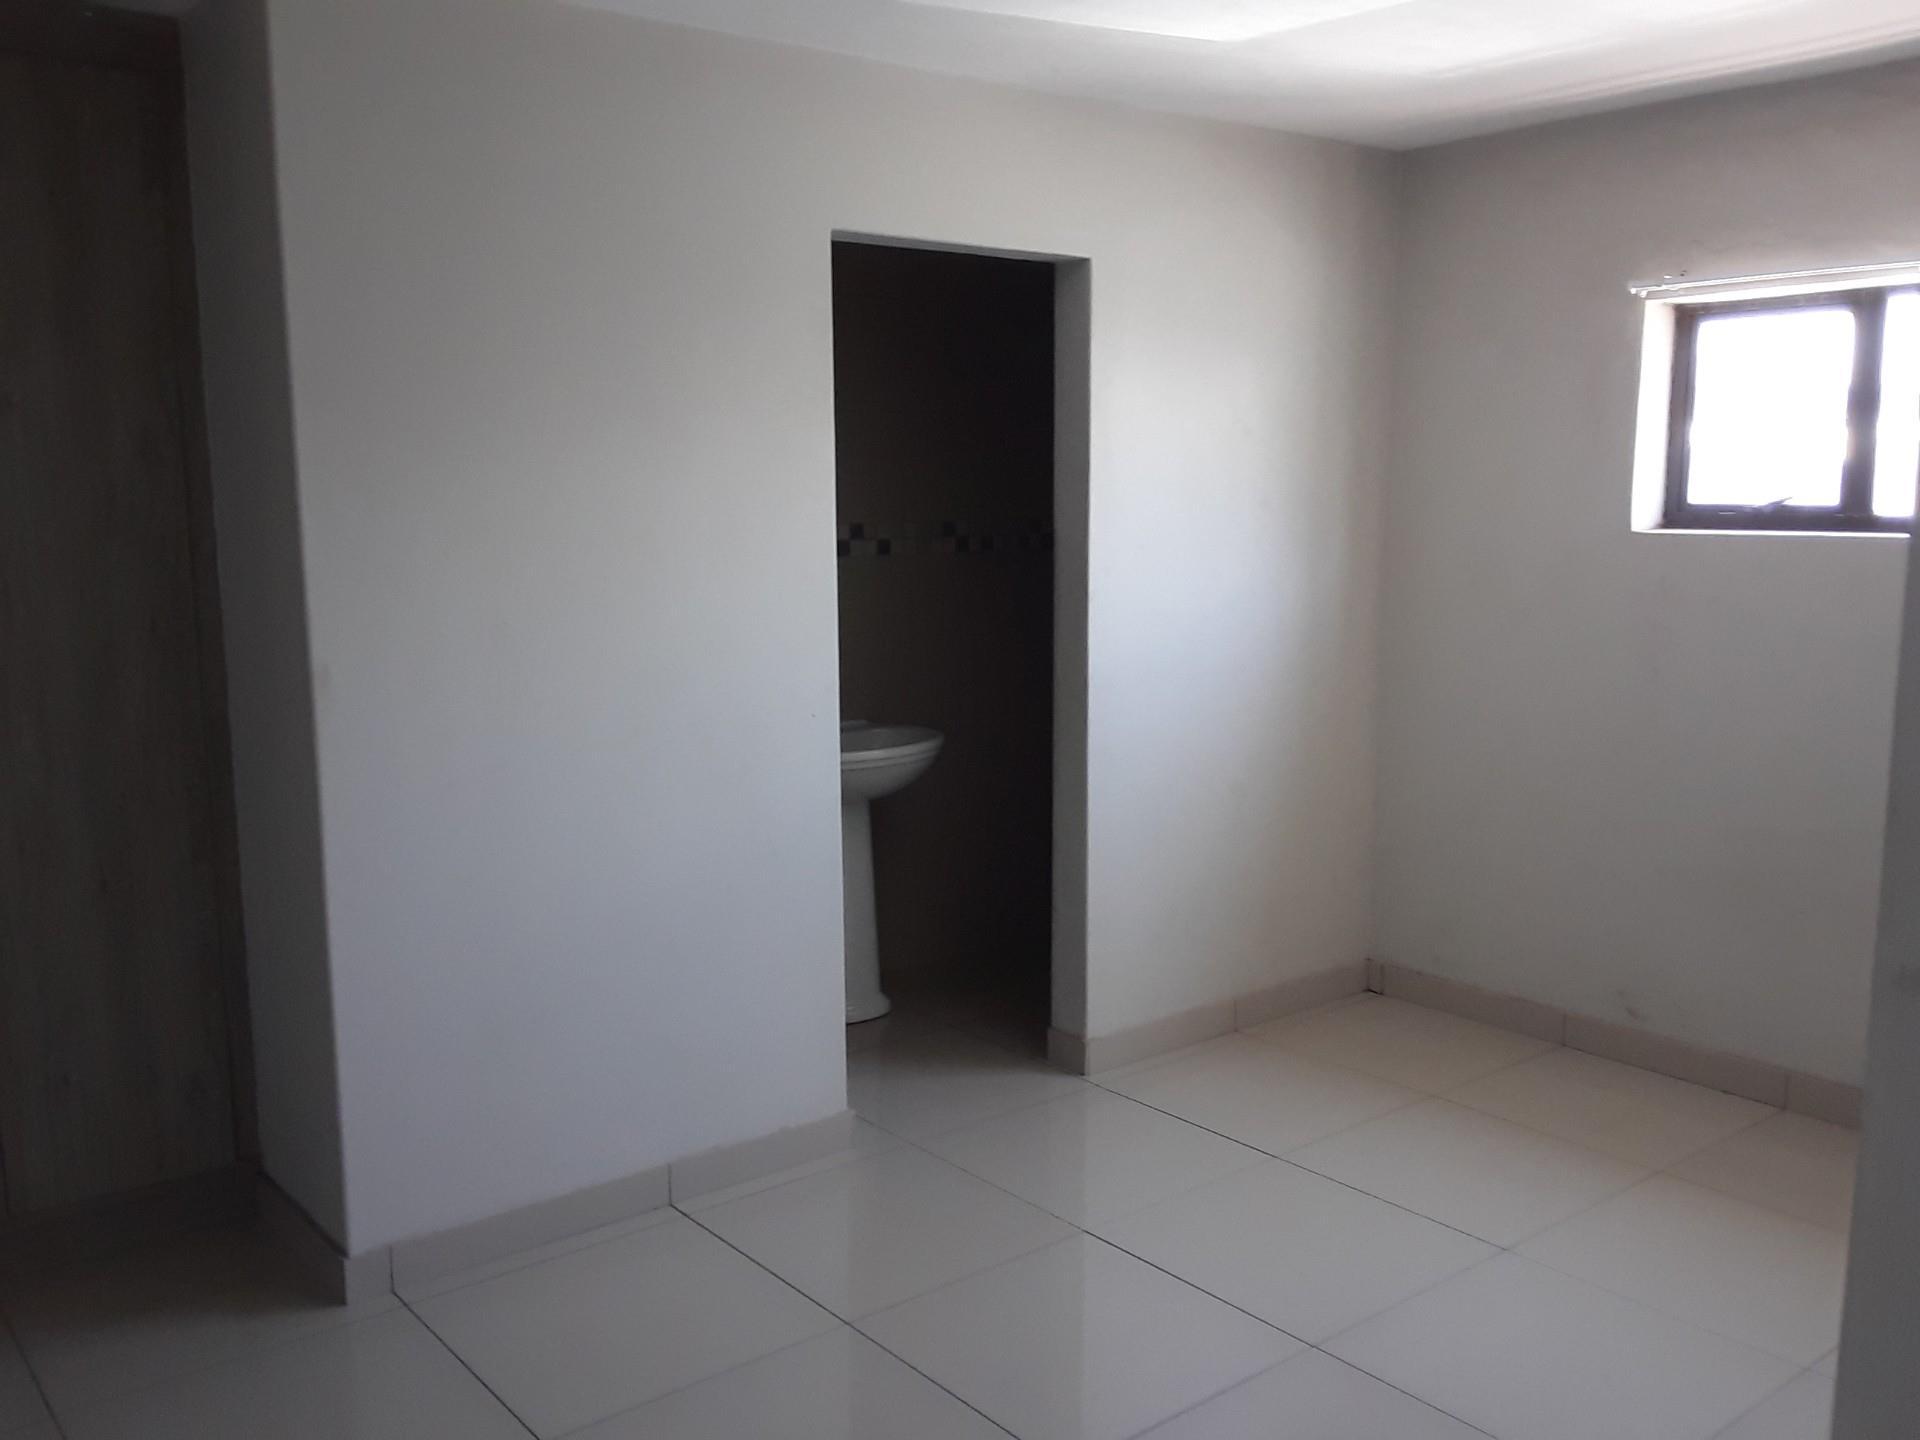 3 Bedroom Apartment / Flat To Rent in Vredenburg